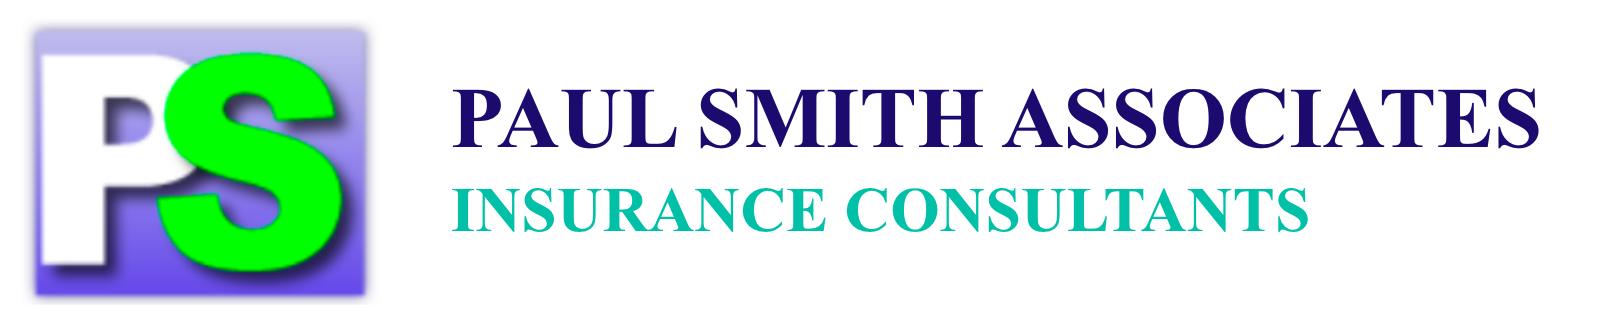 Paul Smith Associates